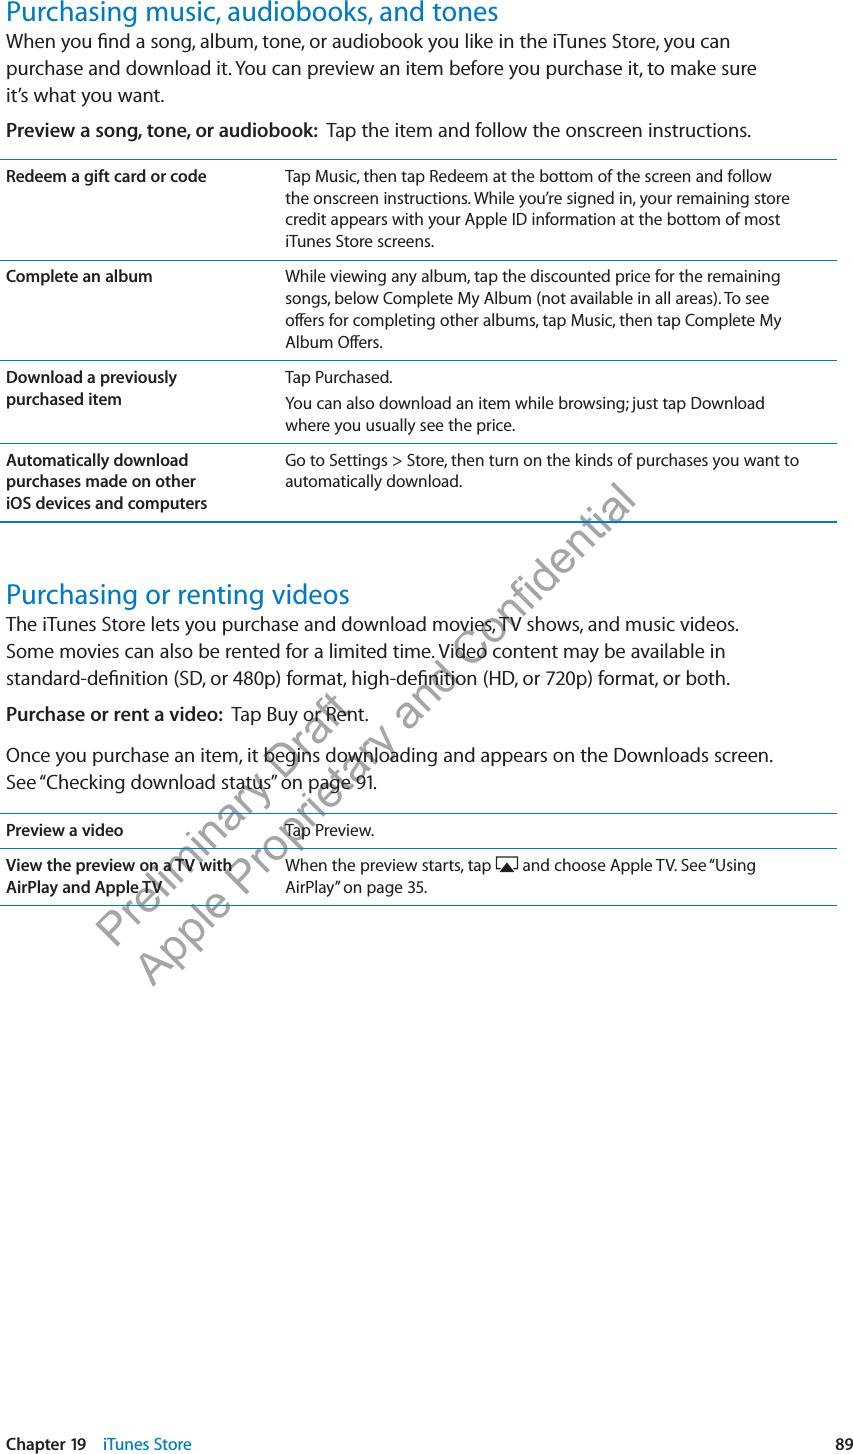 ipad 2 user guide download